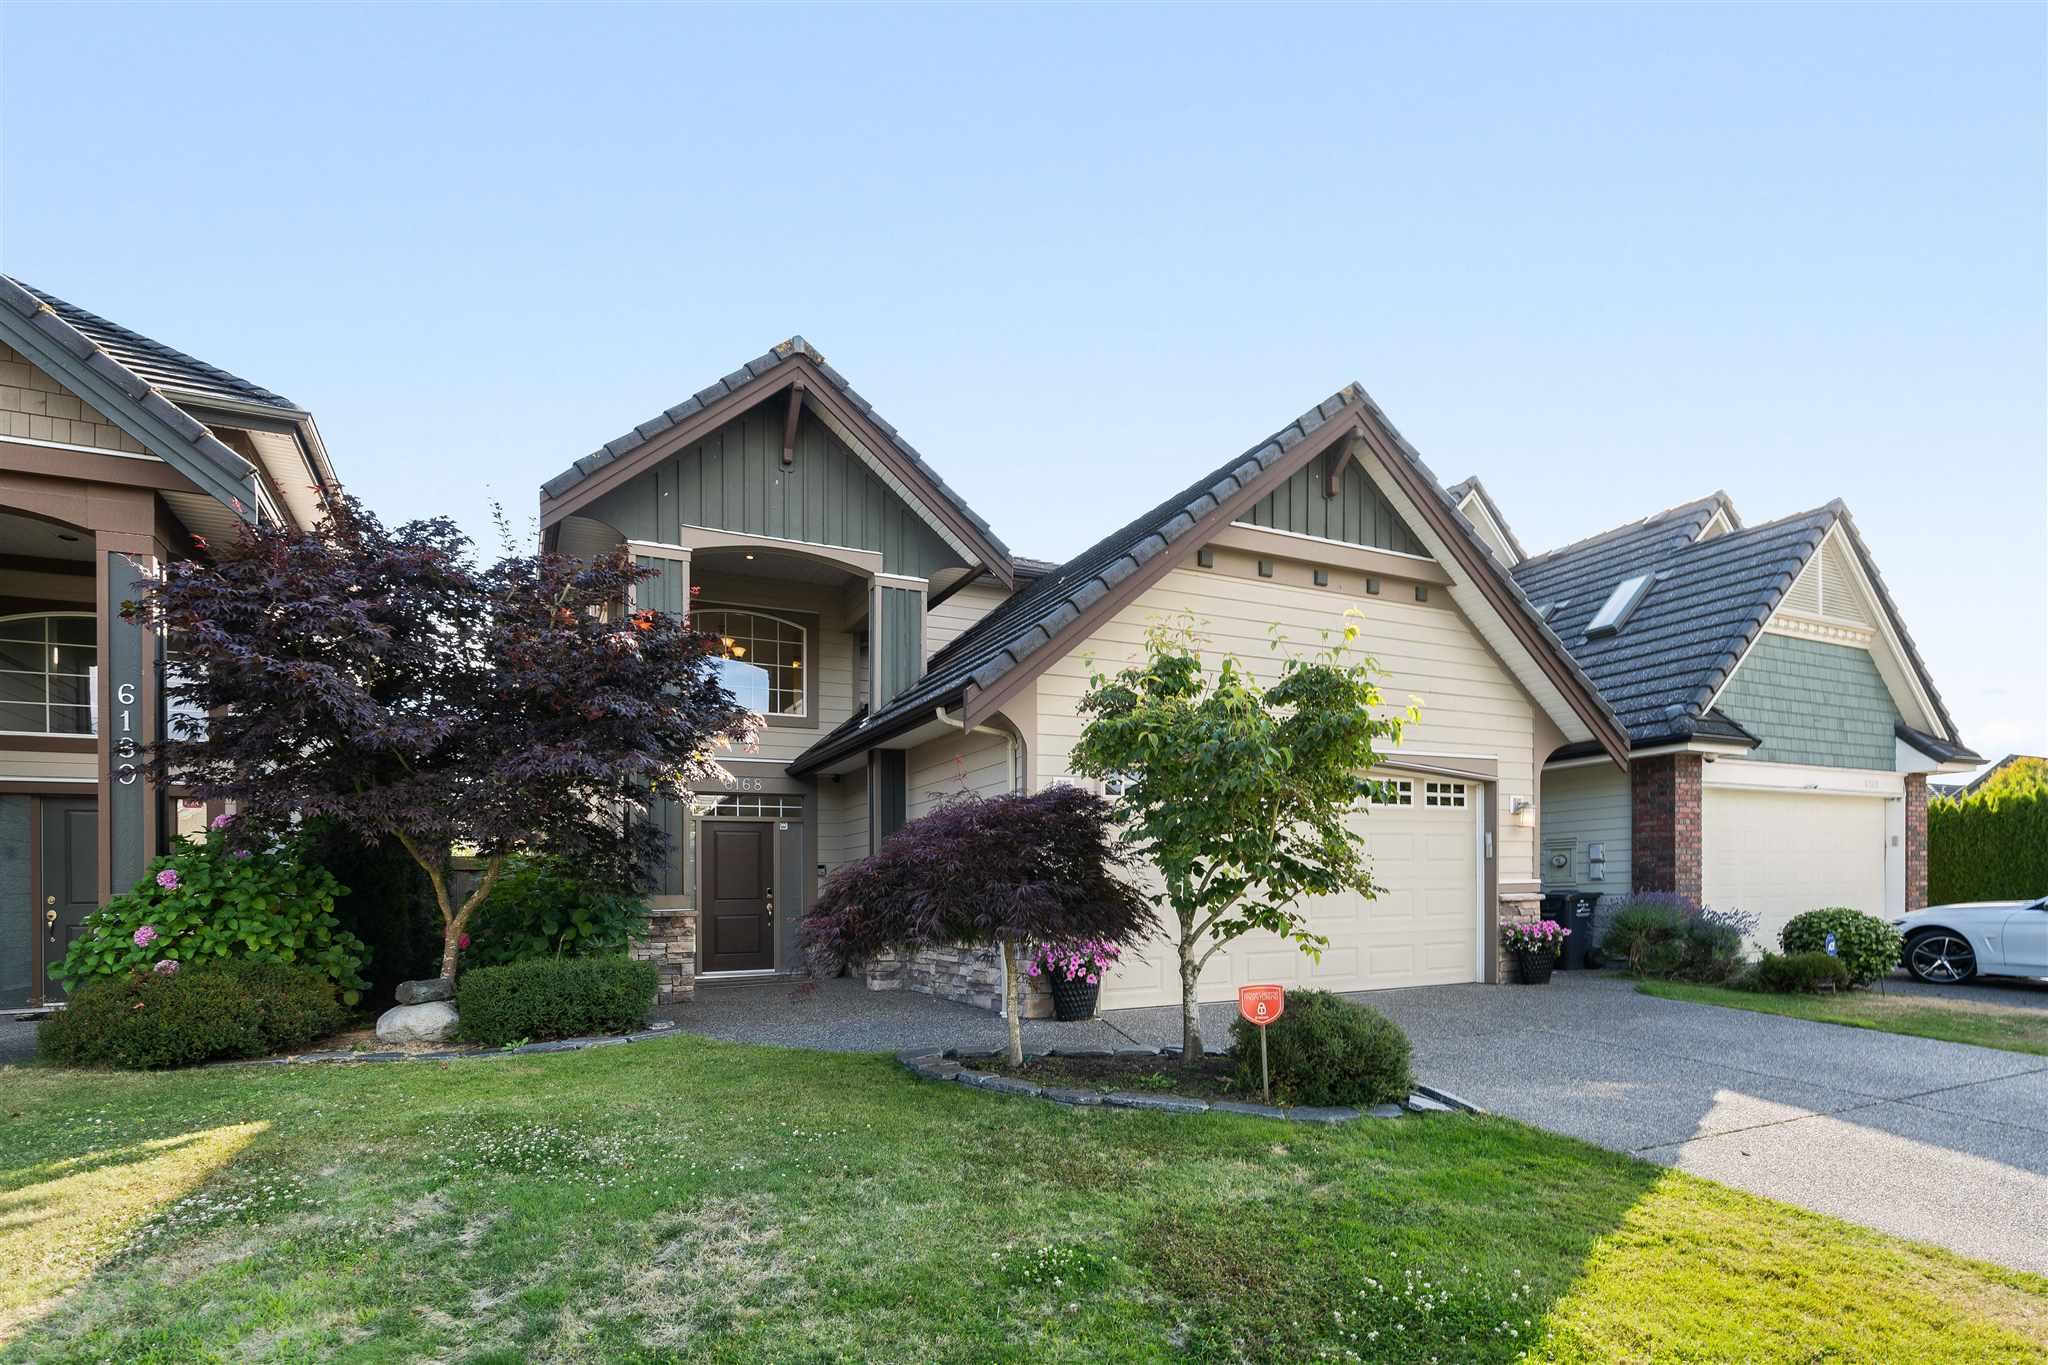 6168 DUNSMUIR CRESCENT - Terra Nova House/Single Family for sale, 5 Bedrooms (R2606044)